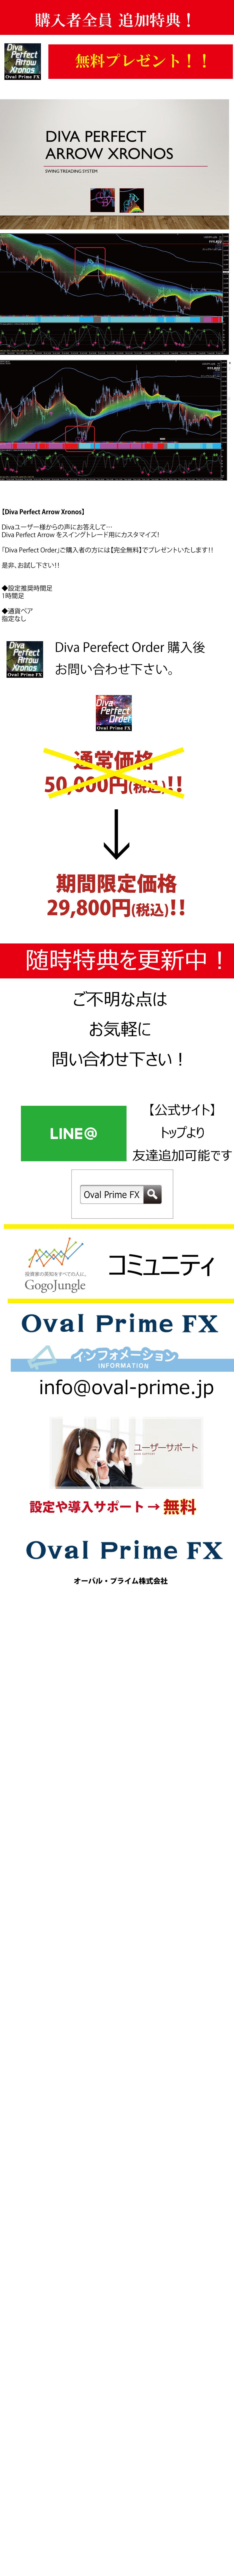 3.Diva-Perfect-Order-LP-Master3.jpg